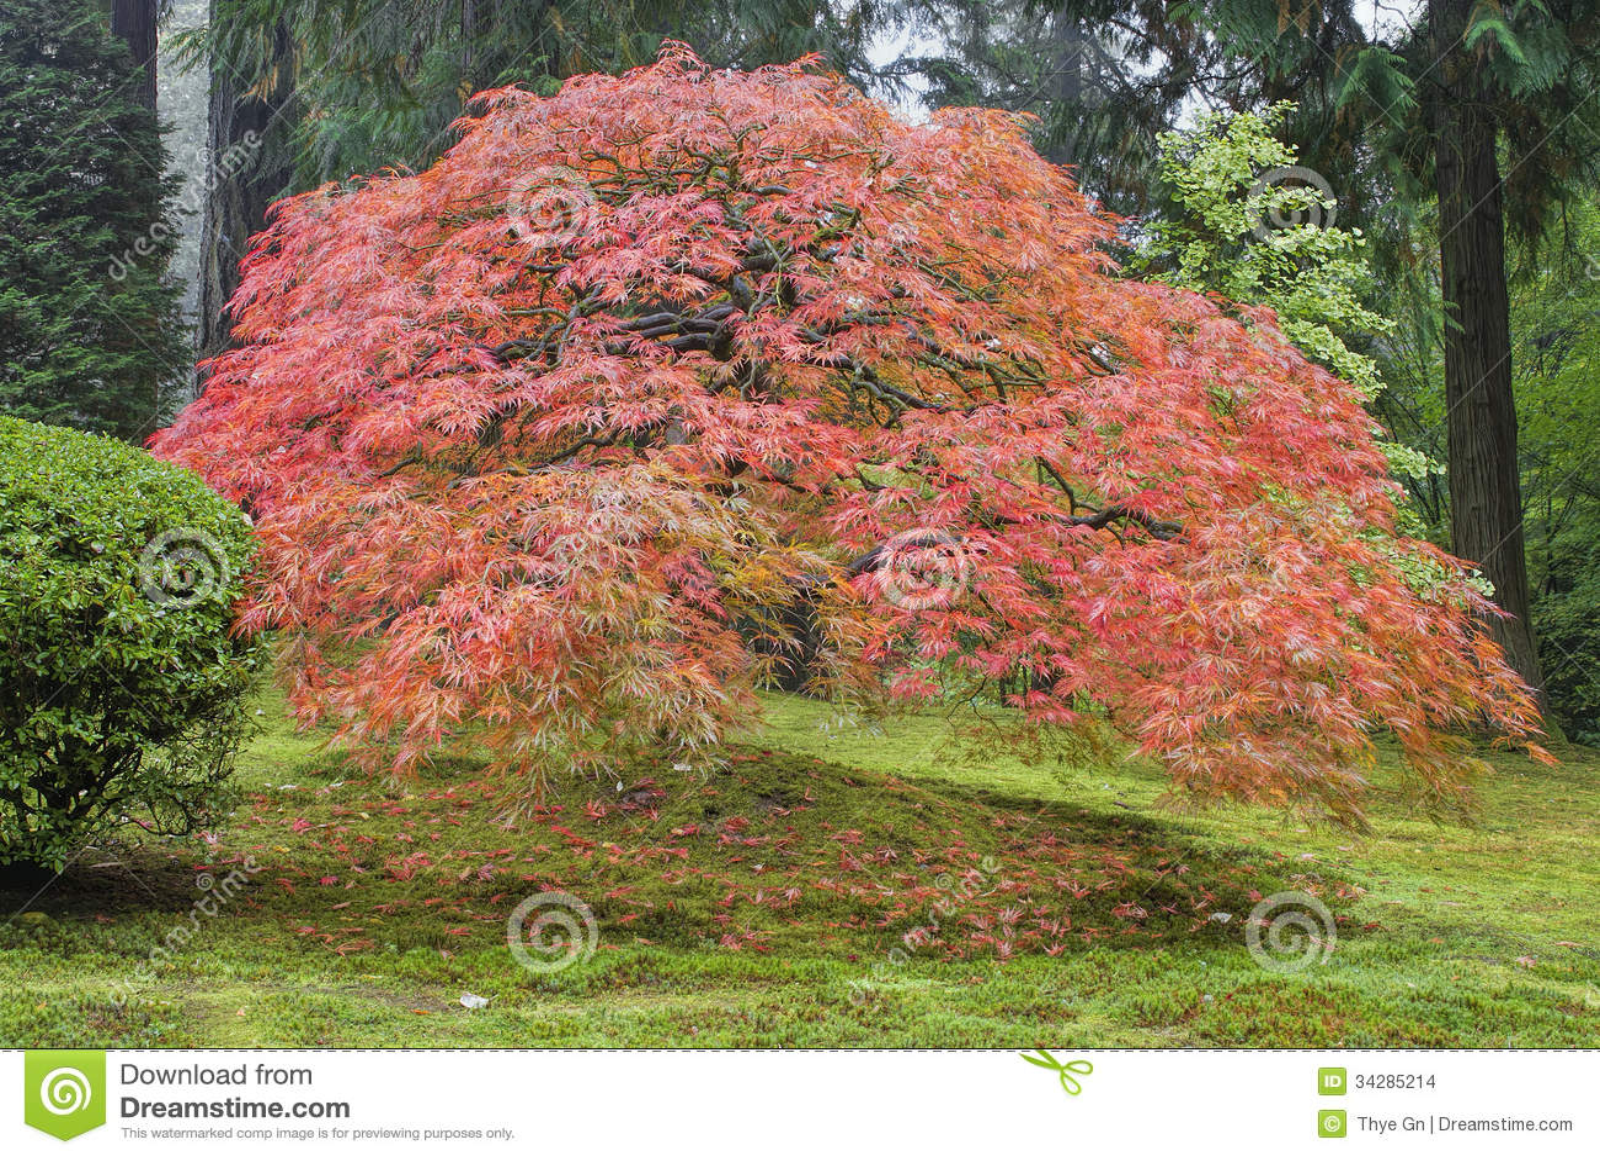 Autumn Leaf Landscaping